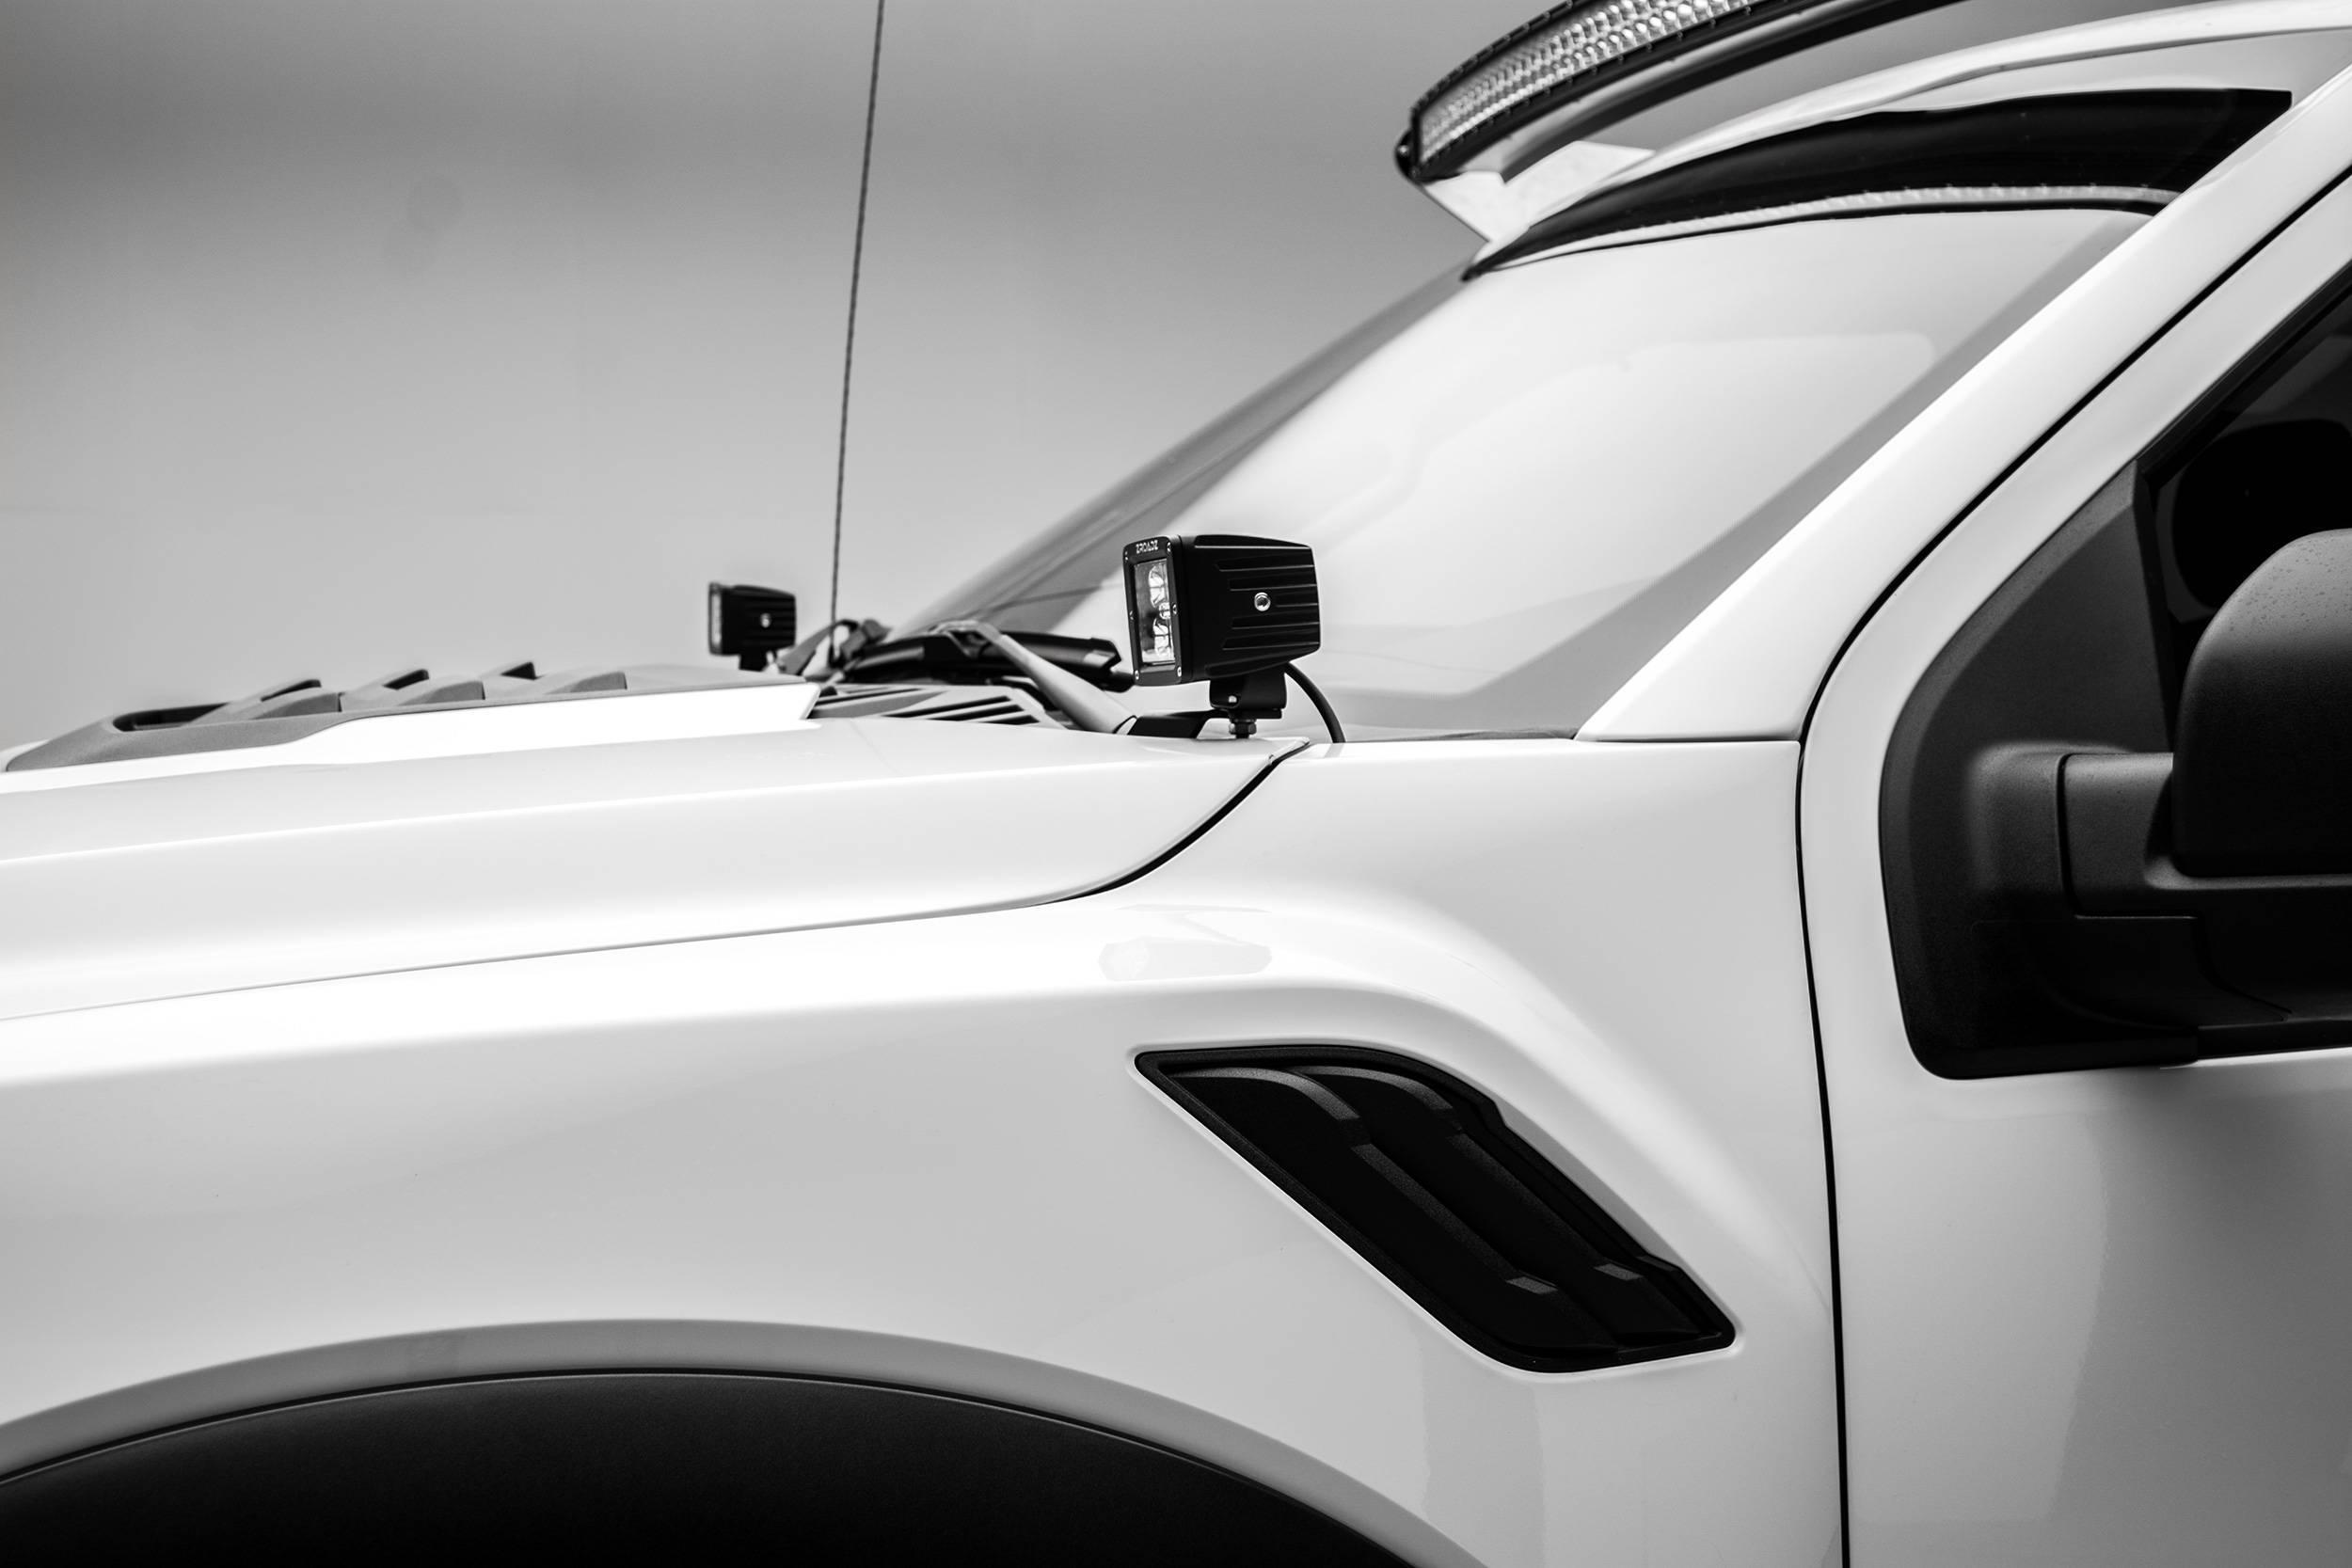 ZROADZ - 2017-2021 Ford F-150 Raptor Hood Hinge LED Bracket to mount (2) 3 Inch LED Pod Lights - PN #Z365701